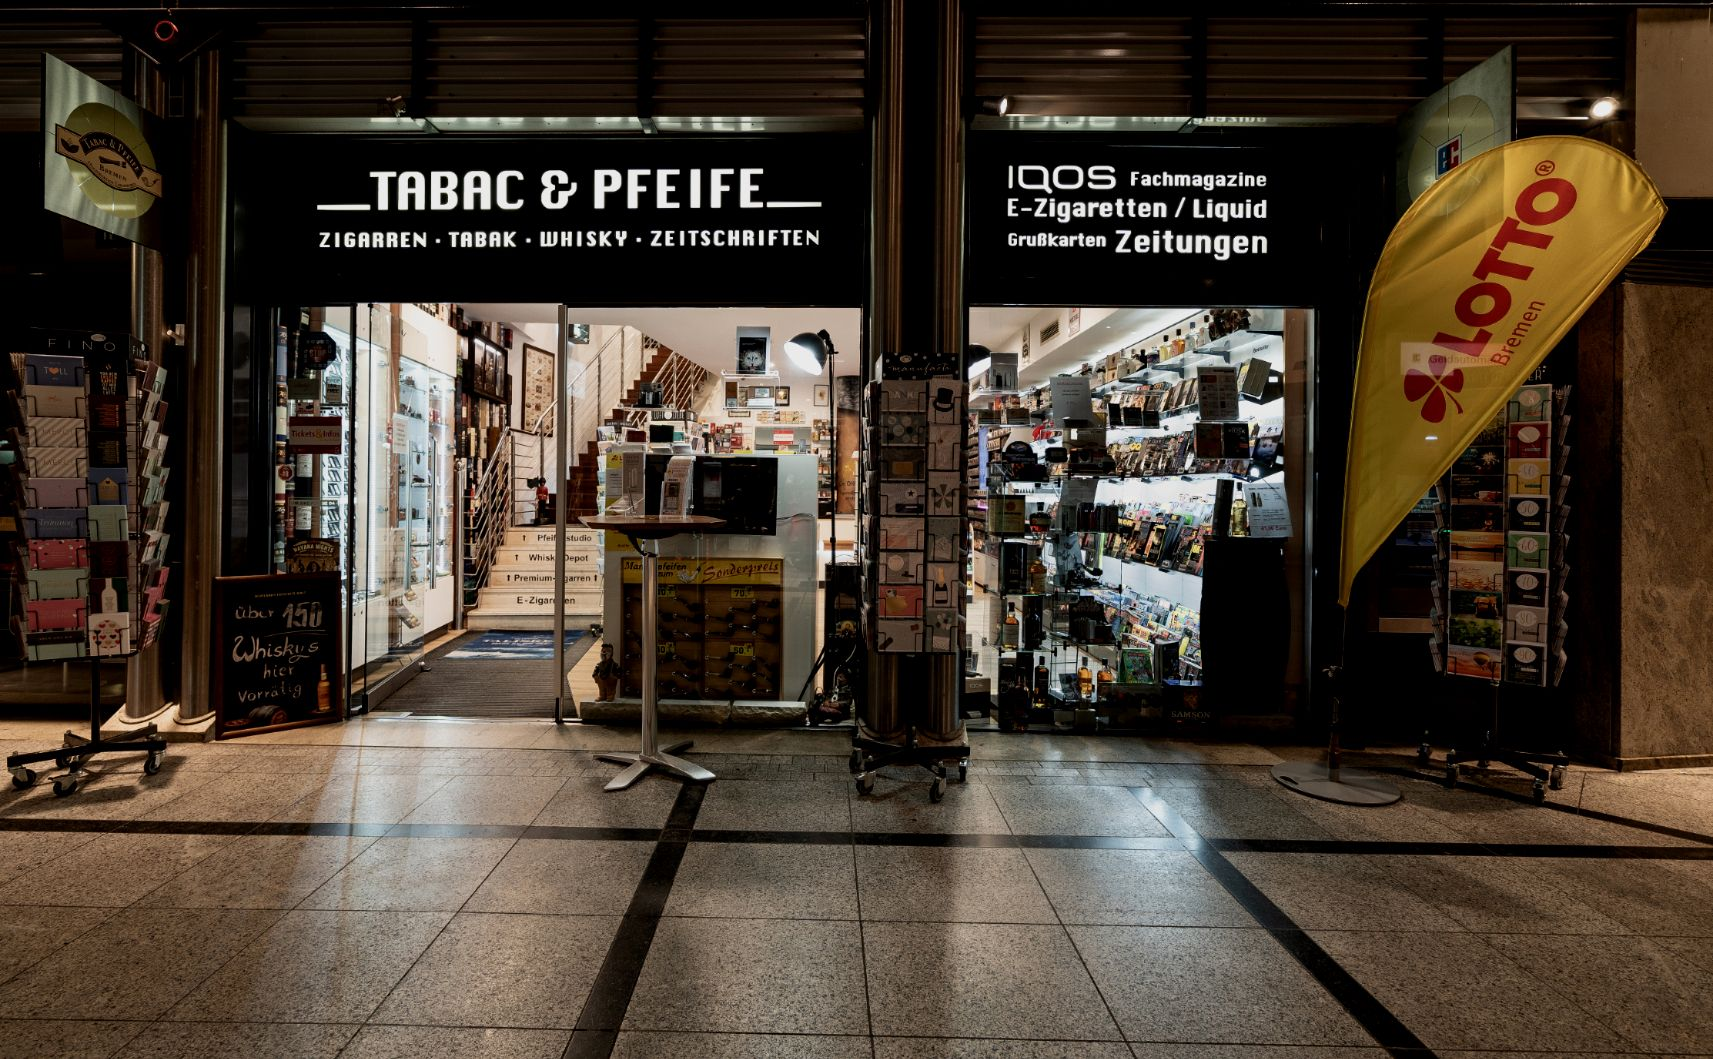 Tabac & Pfeife